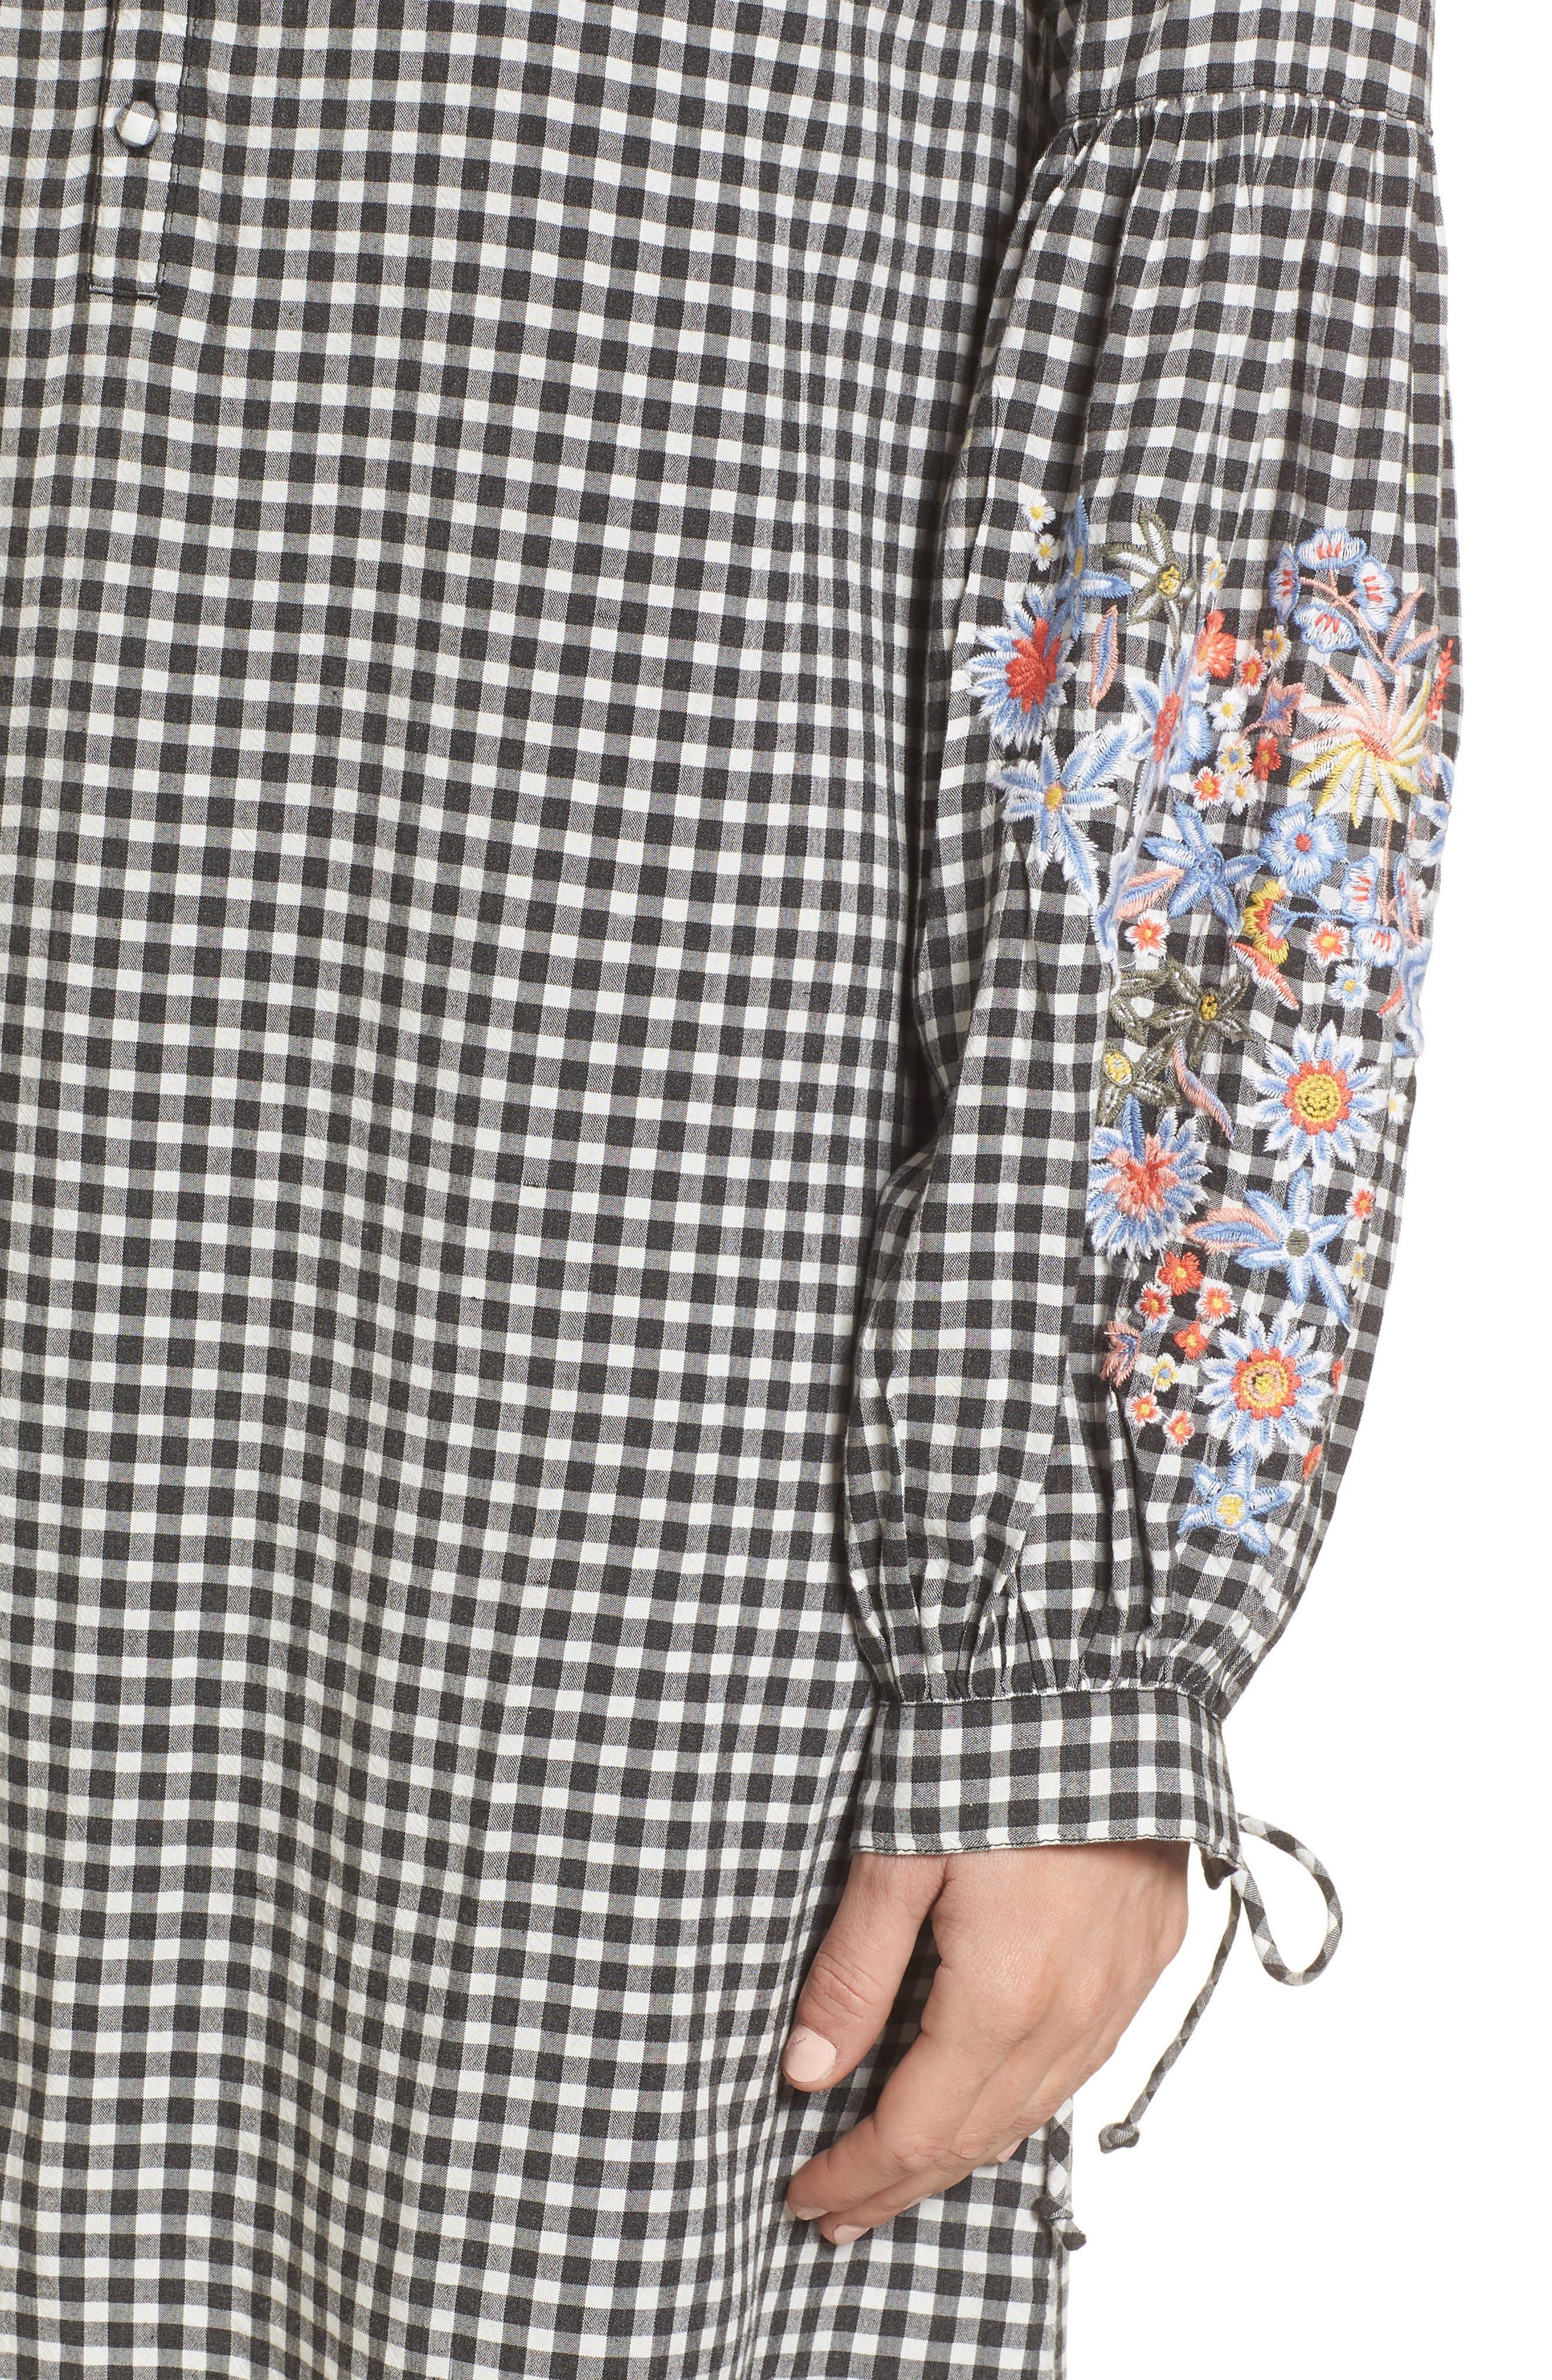 Embroidered Sleeve Shift Dress,                             Alternate thumbnail 4, color,                             Black-White Gingham